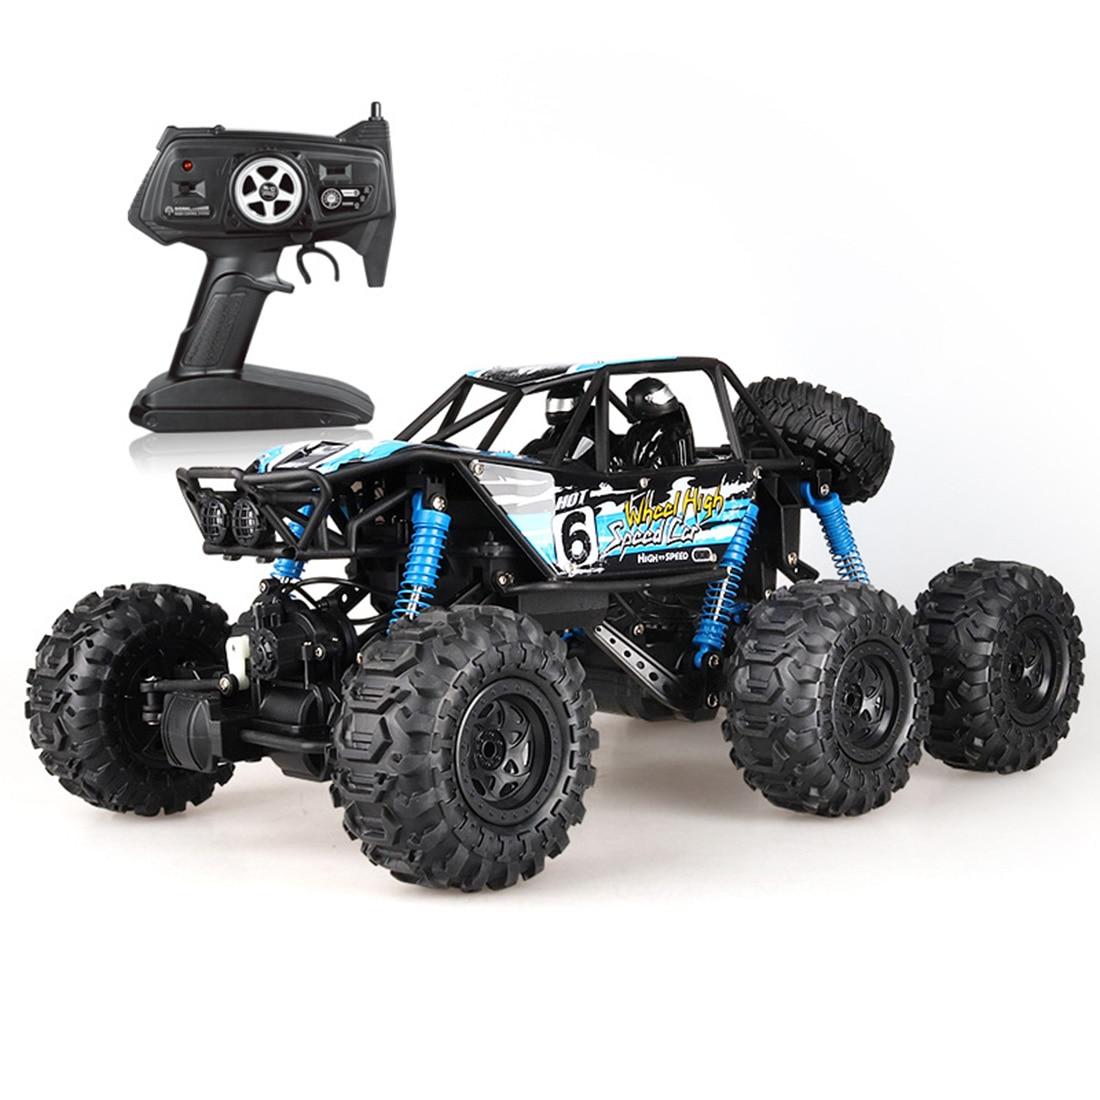 48cm 18 6WD 2,4G RC coche de escalada todoterreno anfibio coche de alta velocidad juguete para regalo educativo para chico adulto-azul amarillo XL